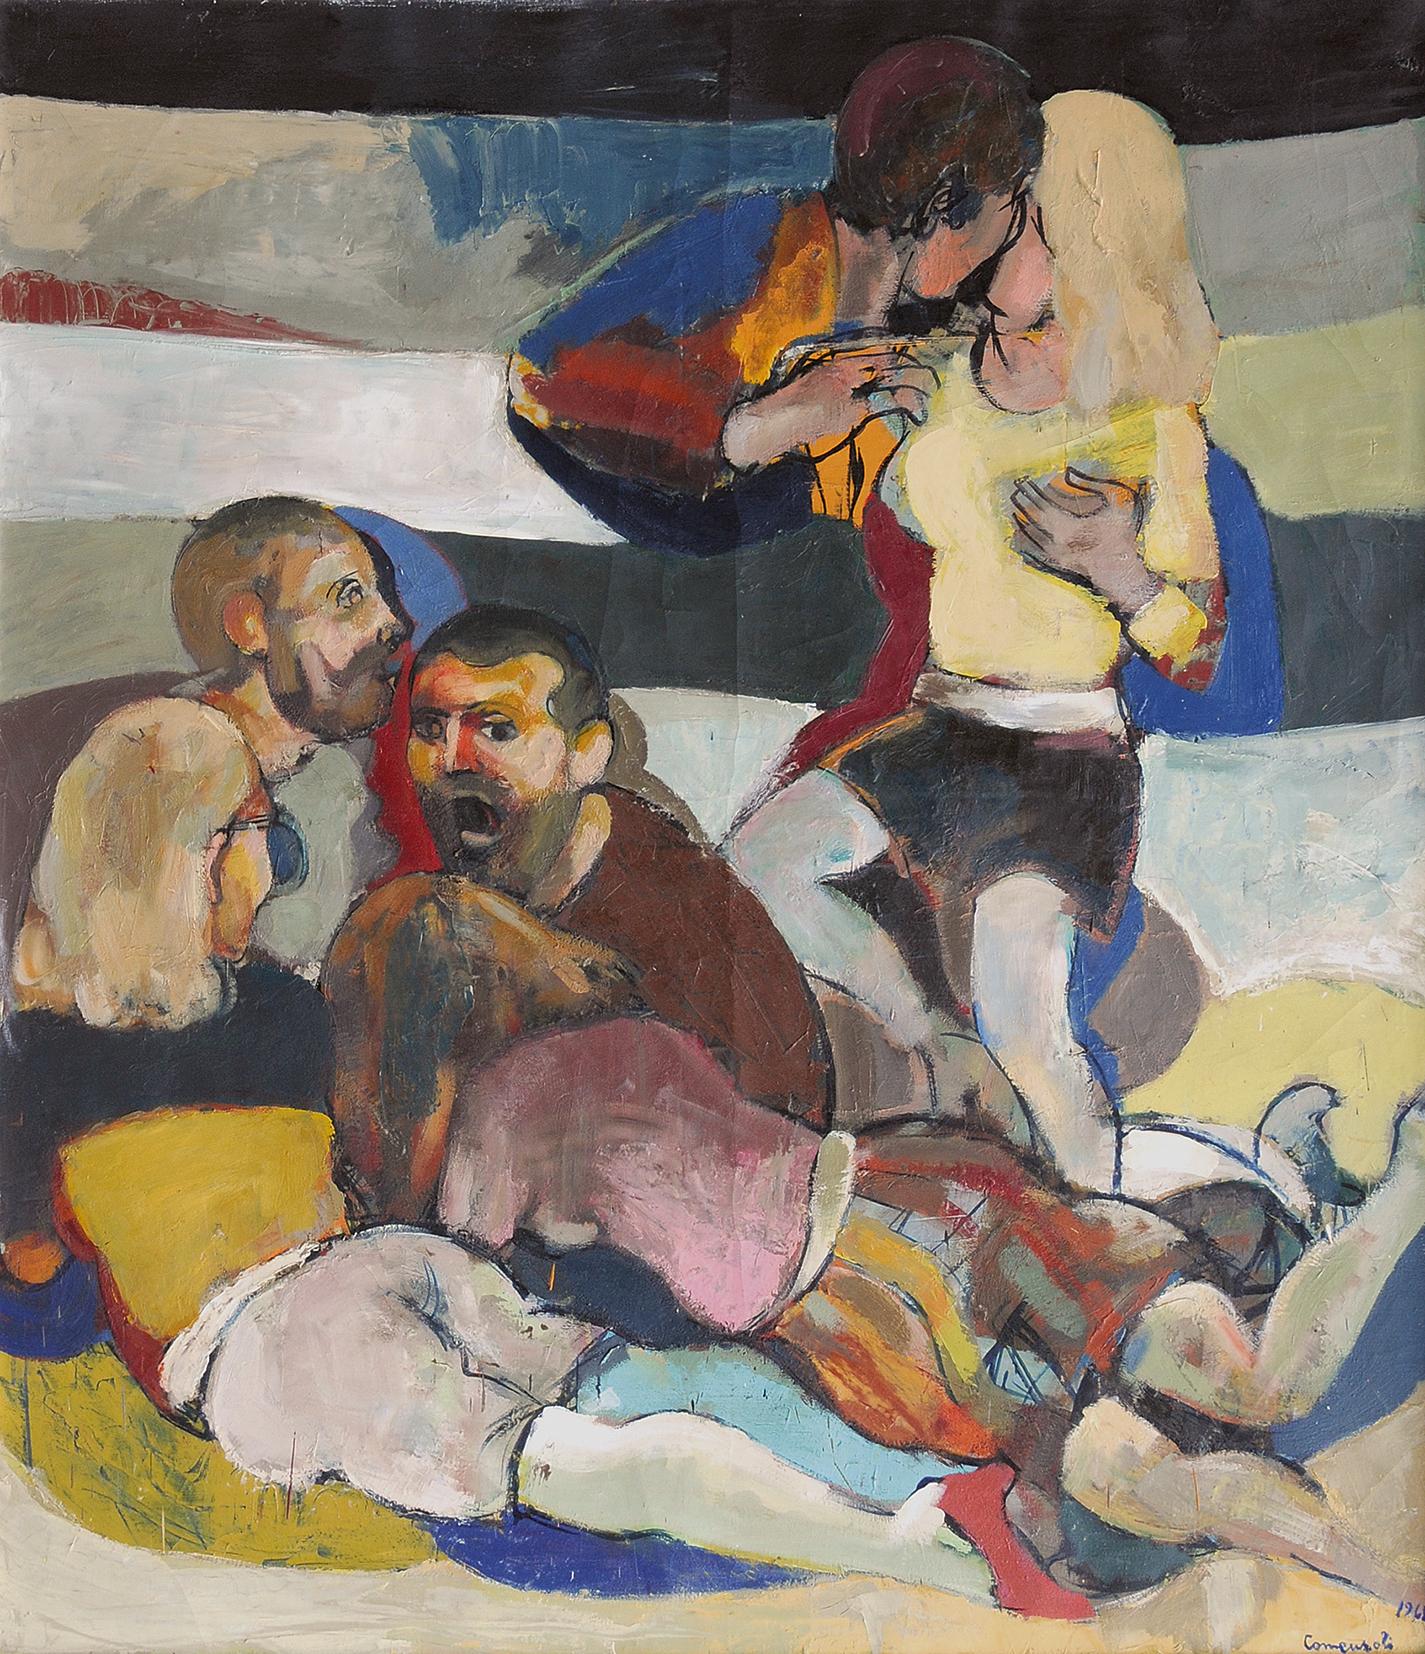 Mario Comensoli, Triptychon Teil III